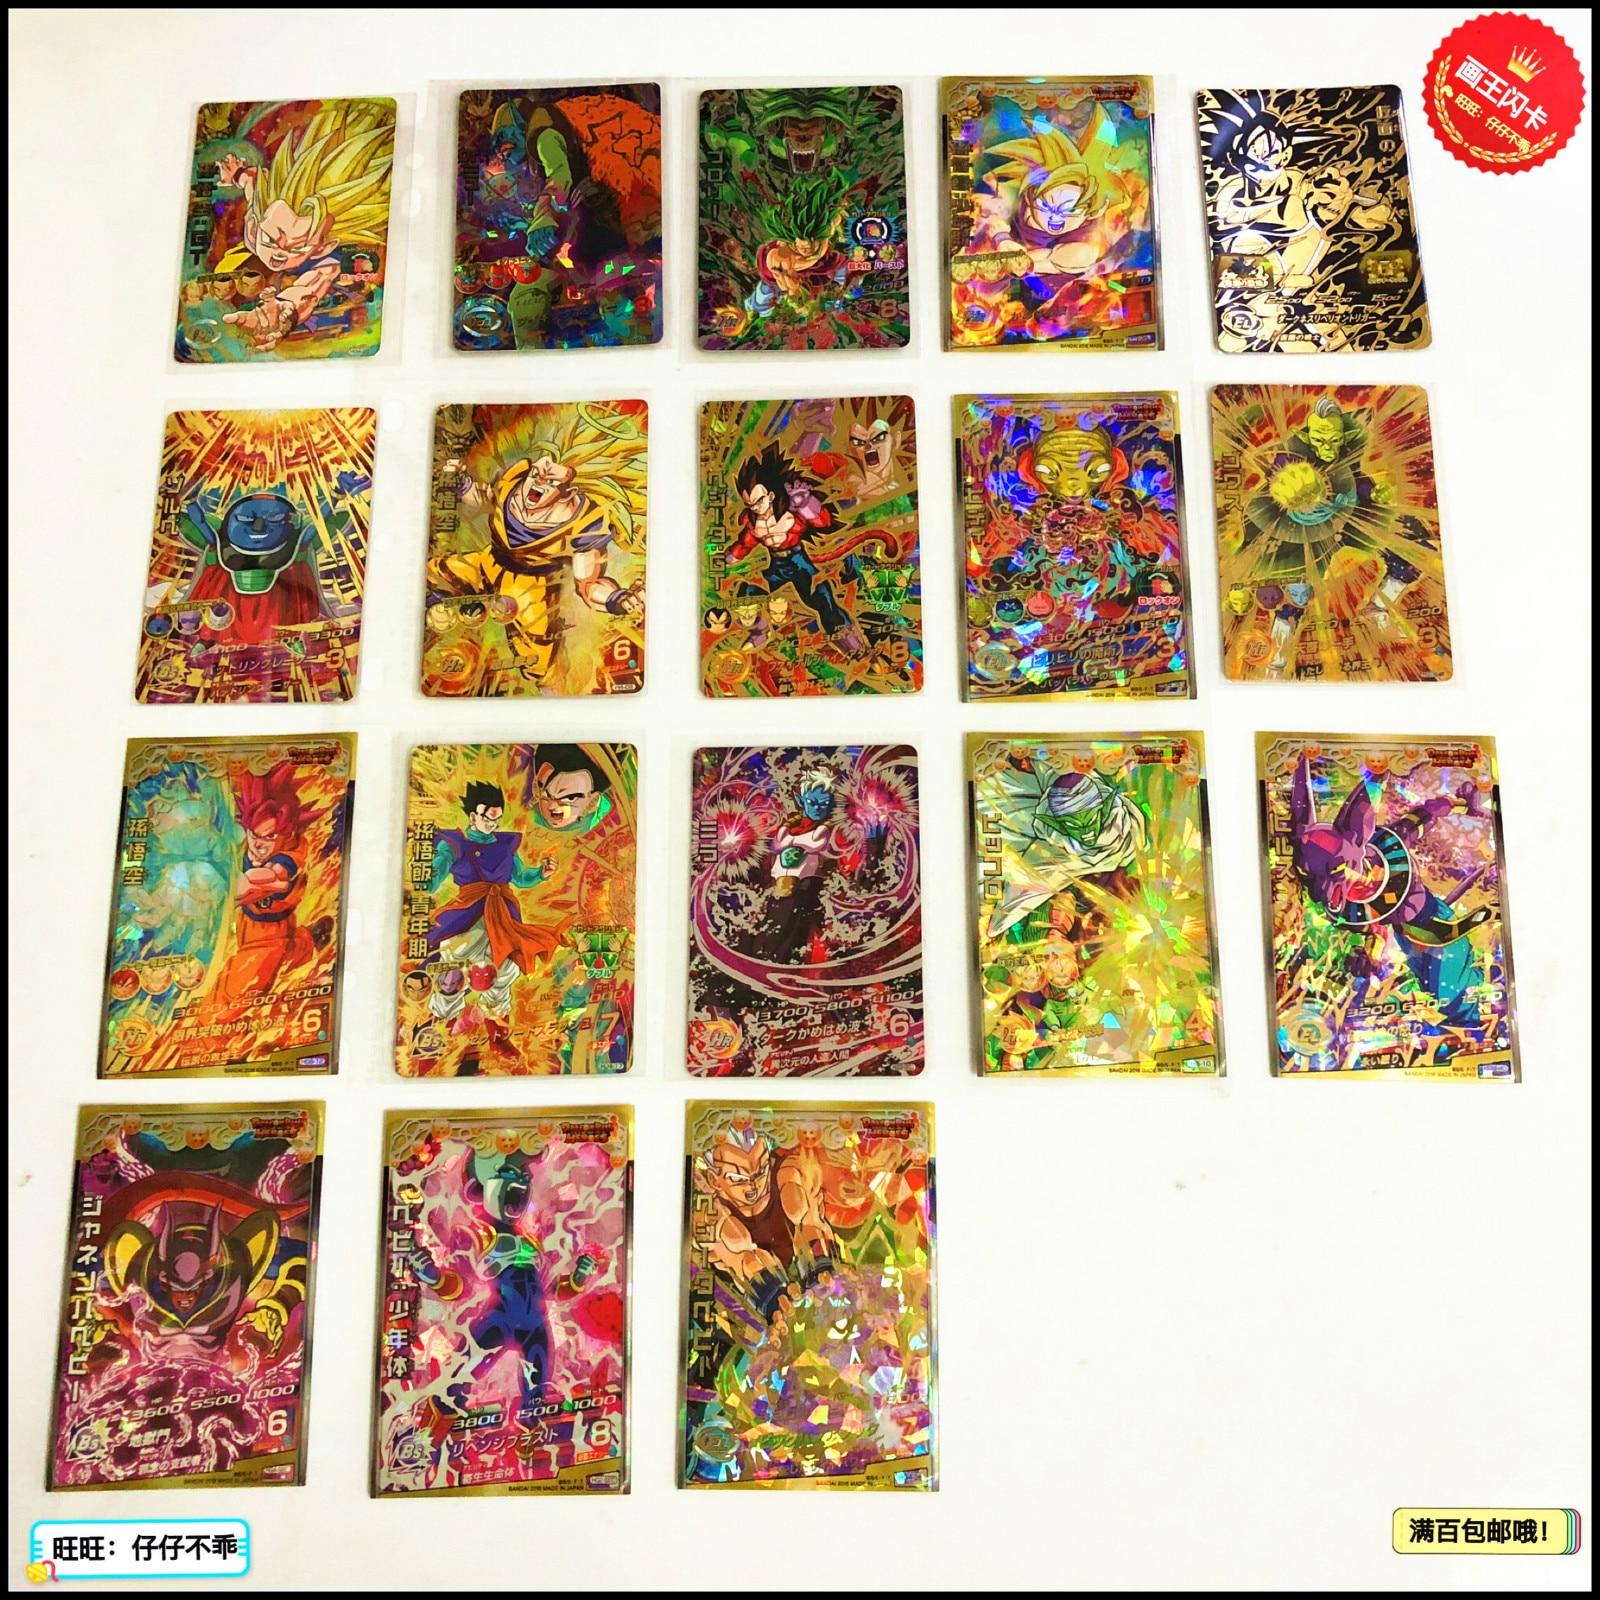 Japan Original Dragon Ball Hero Card 4 Stars Goku Toys Hobbies Collectibles Game Collection Anime Cards